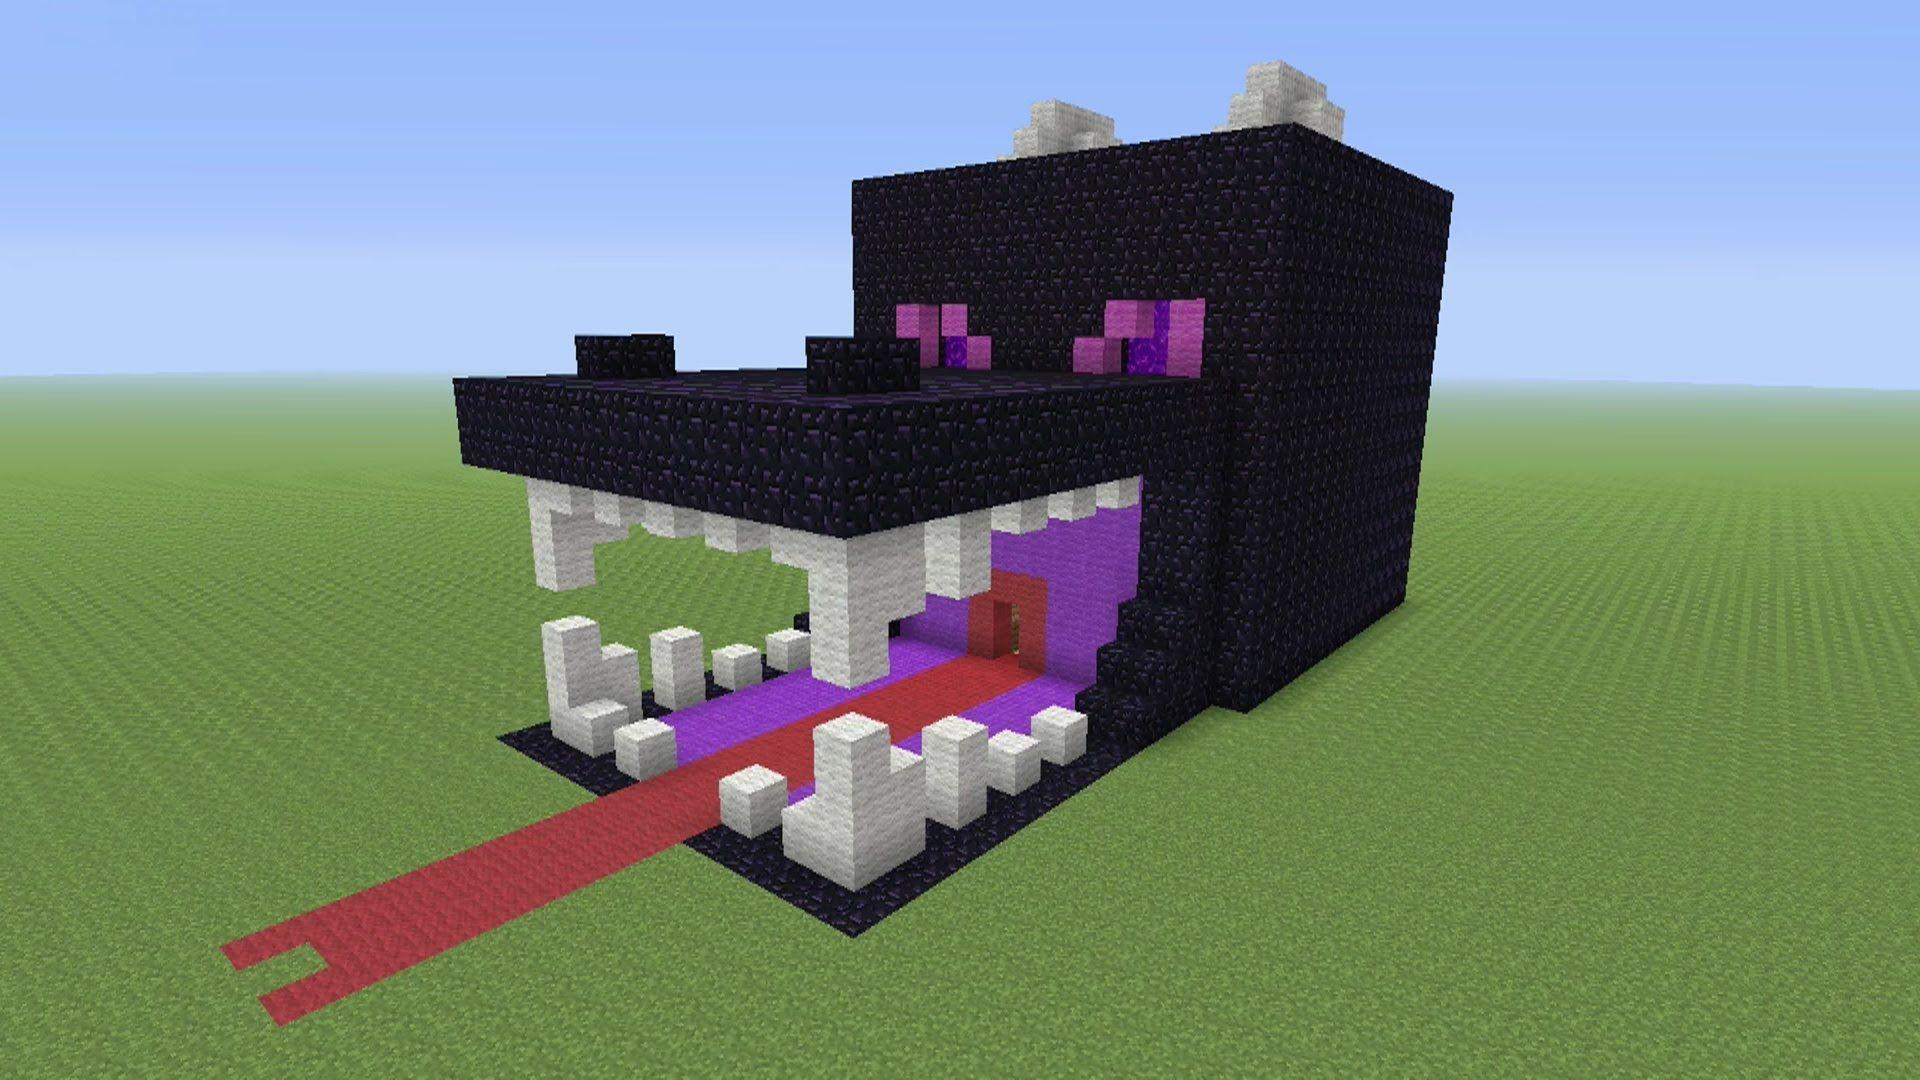 Pin by Candis Barber on m i n e c r a f t | Minecraft ...